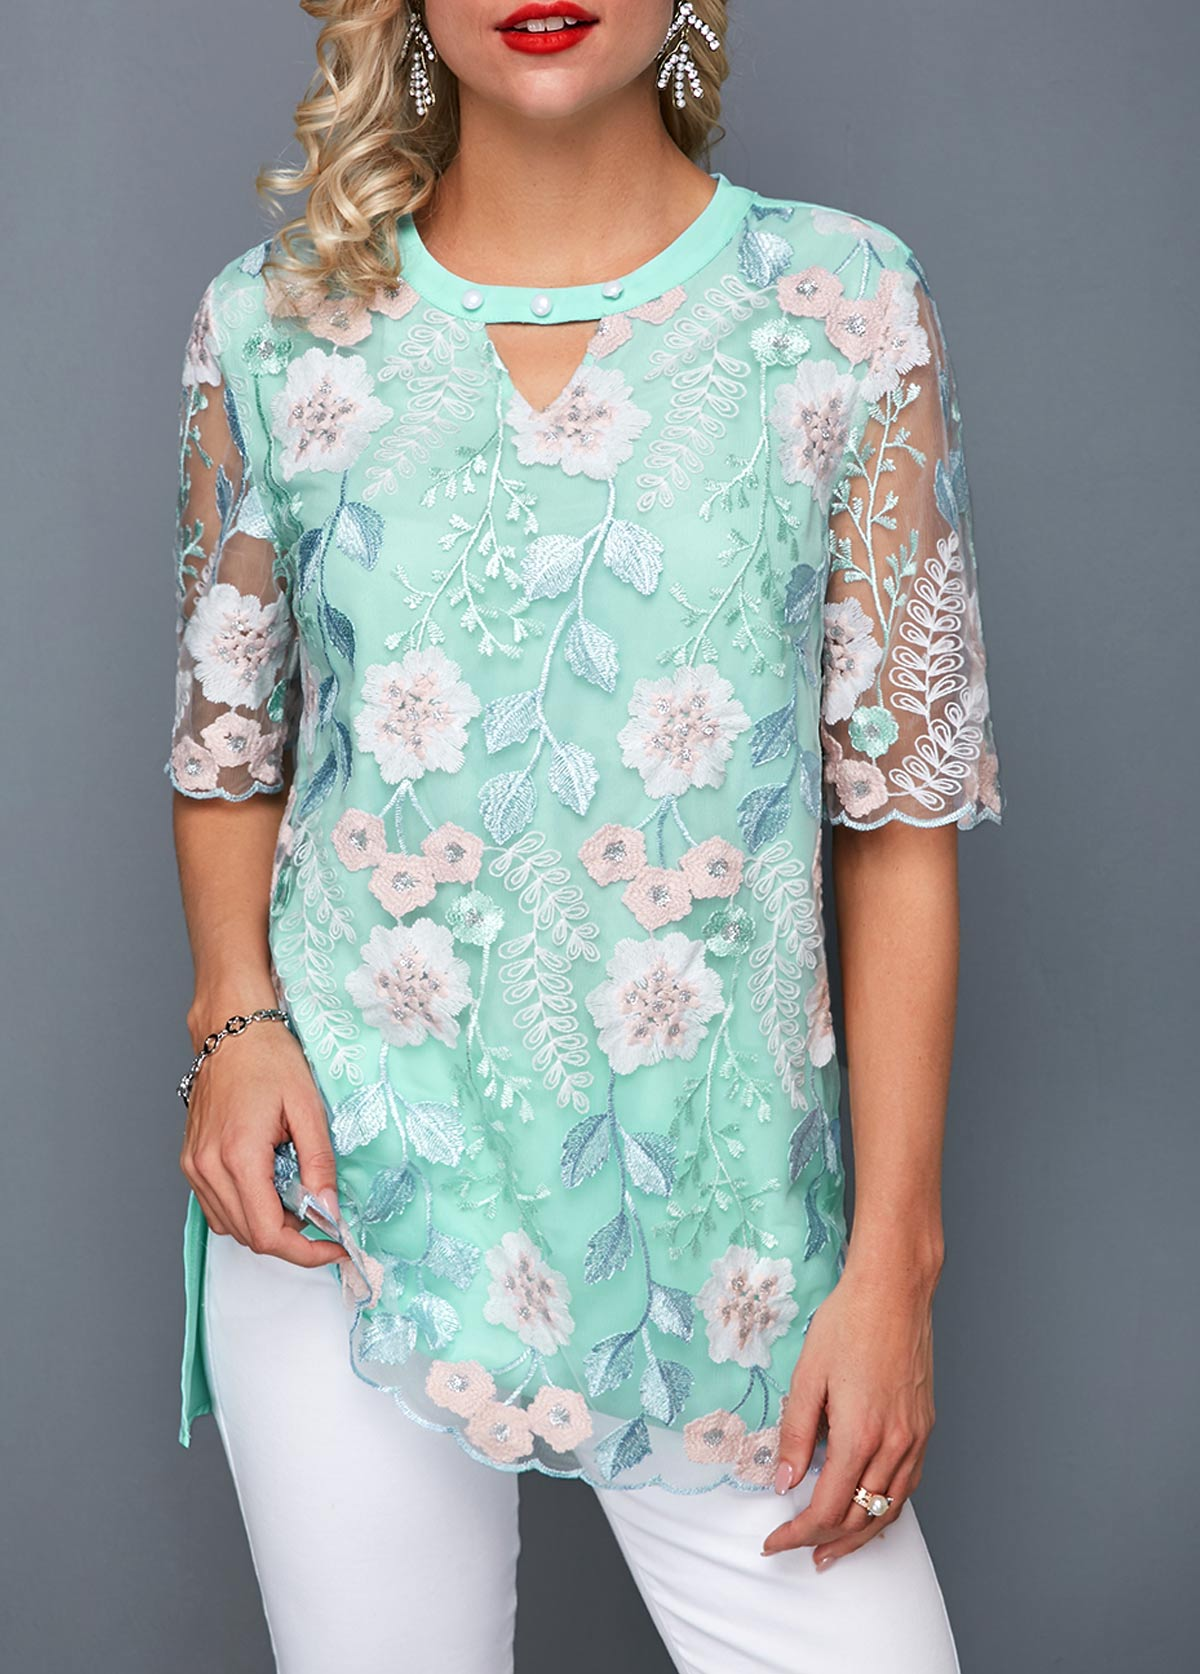 Keyhole Neckline Faux Pearl Embellished Blouse